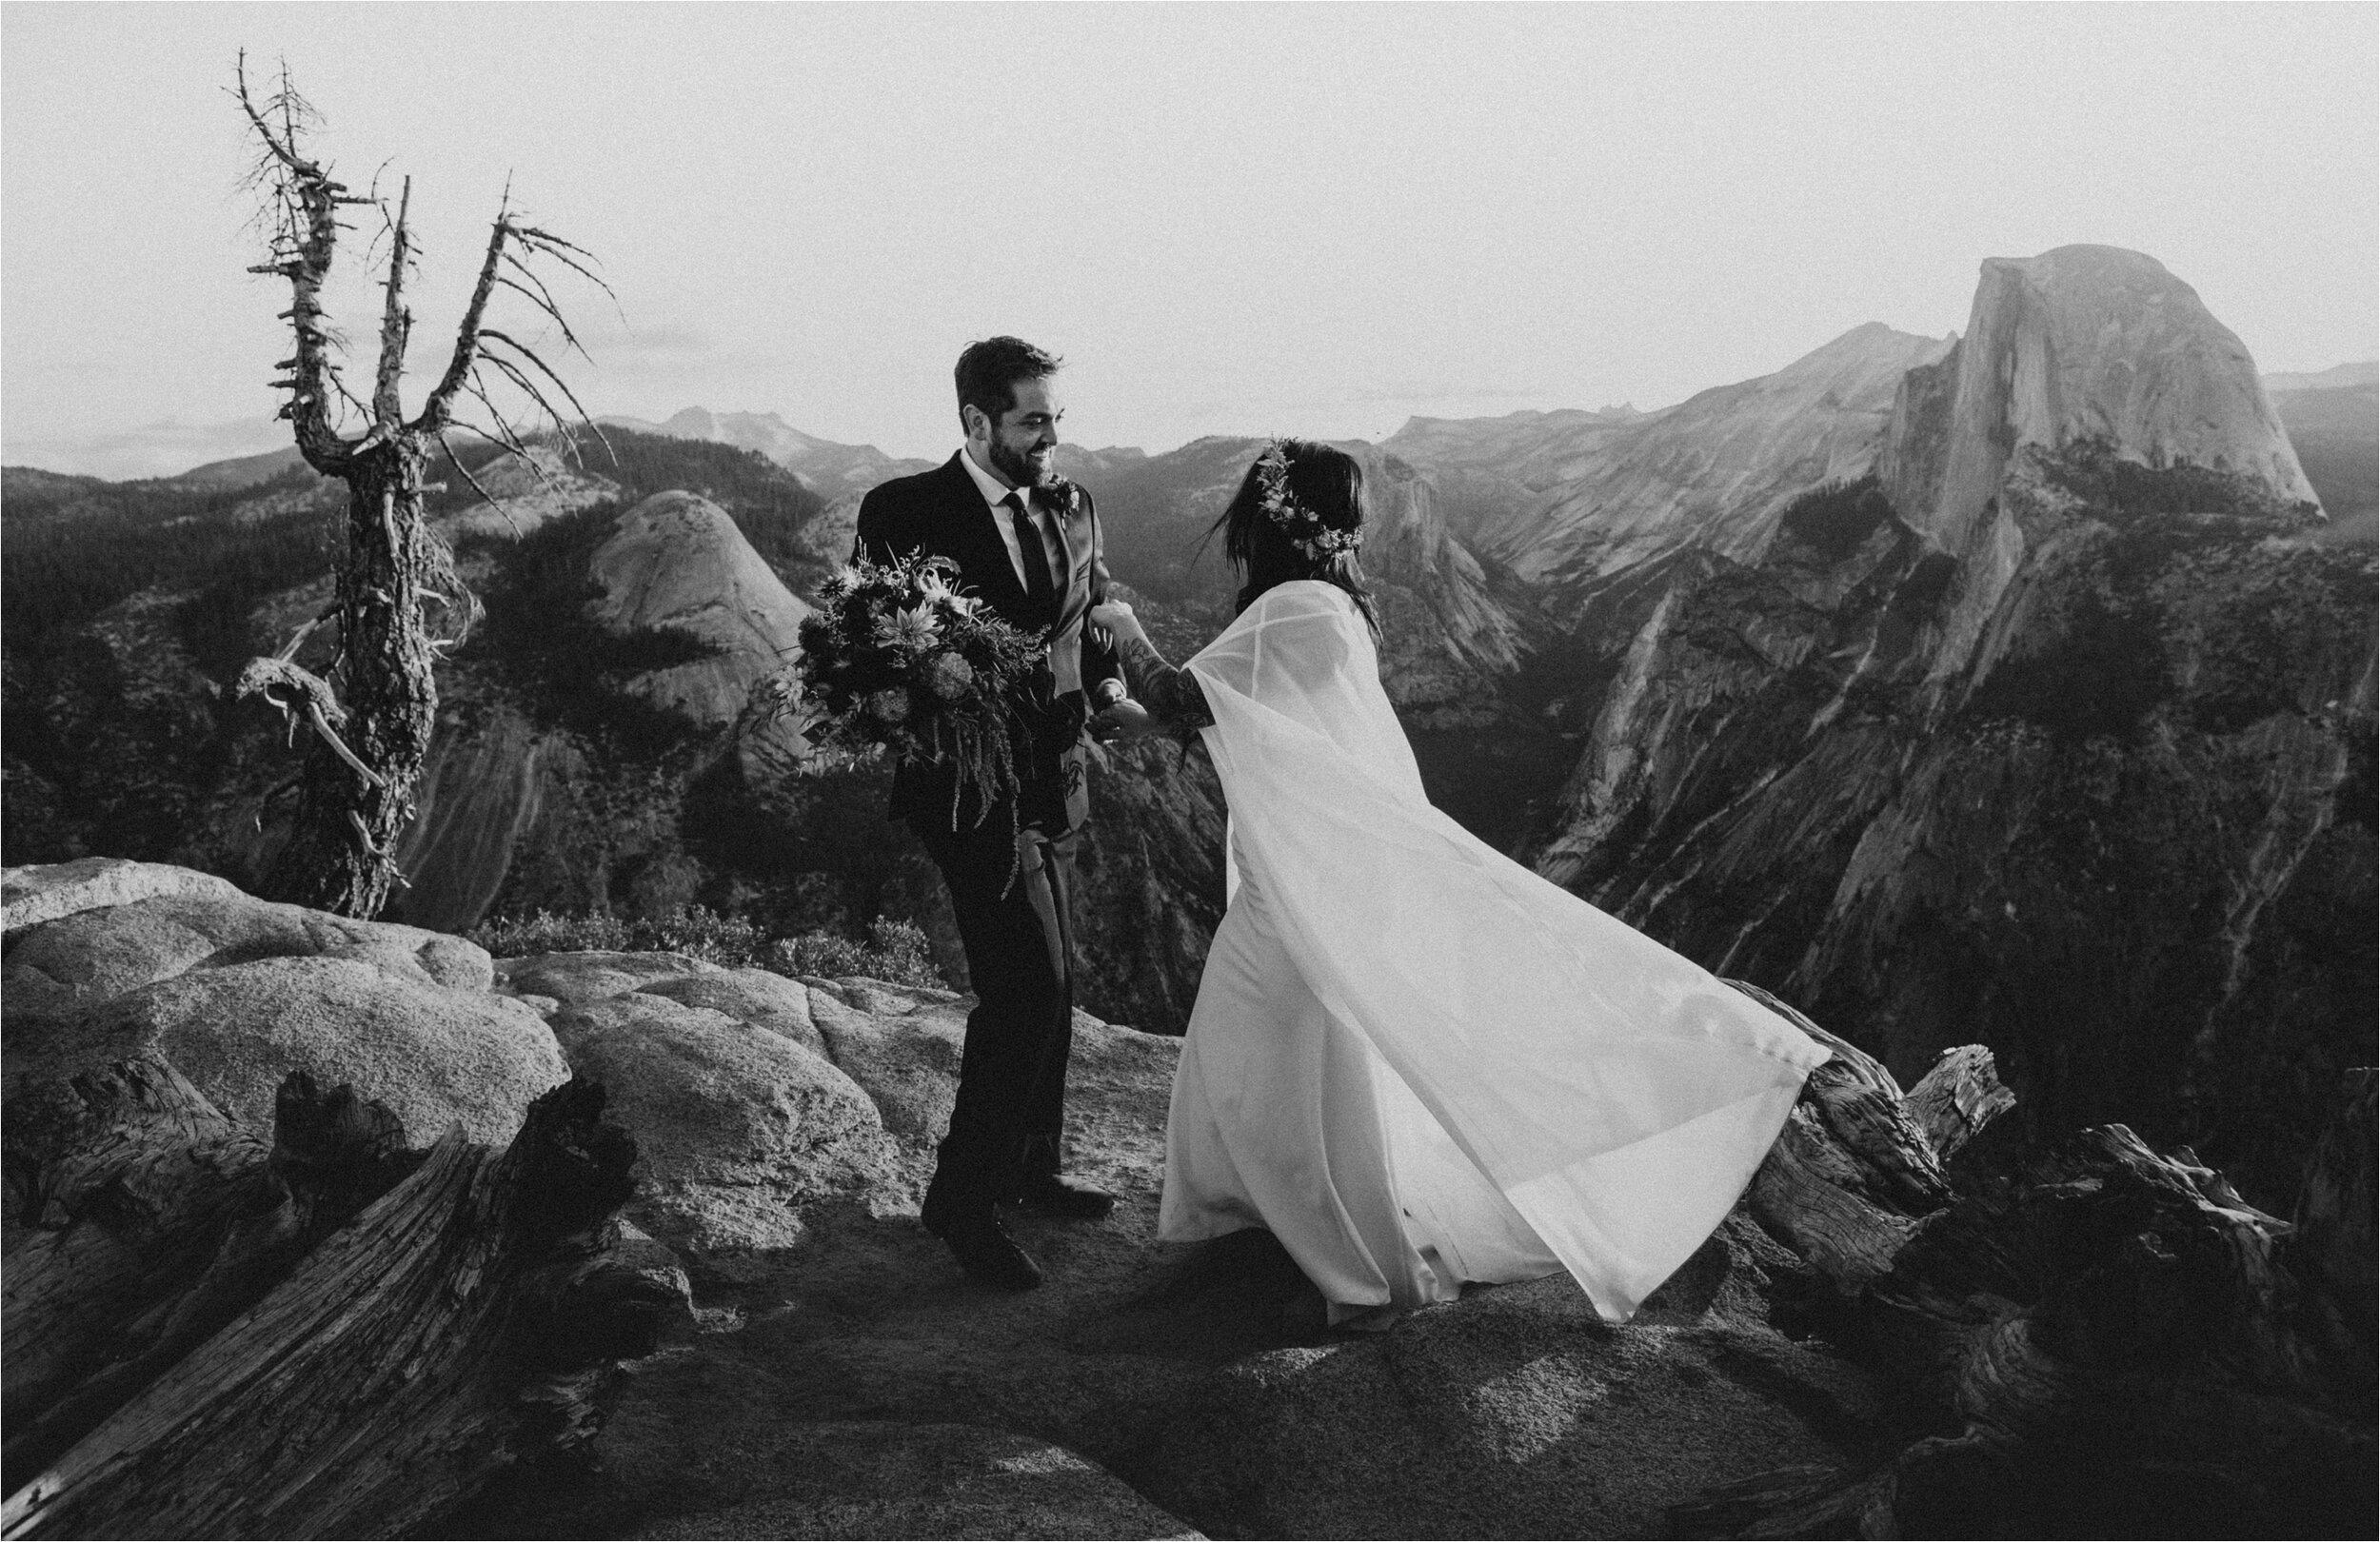 glacier-point-yosemite-elopement-ceremony_0025.jpg